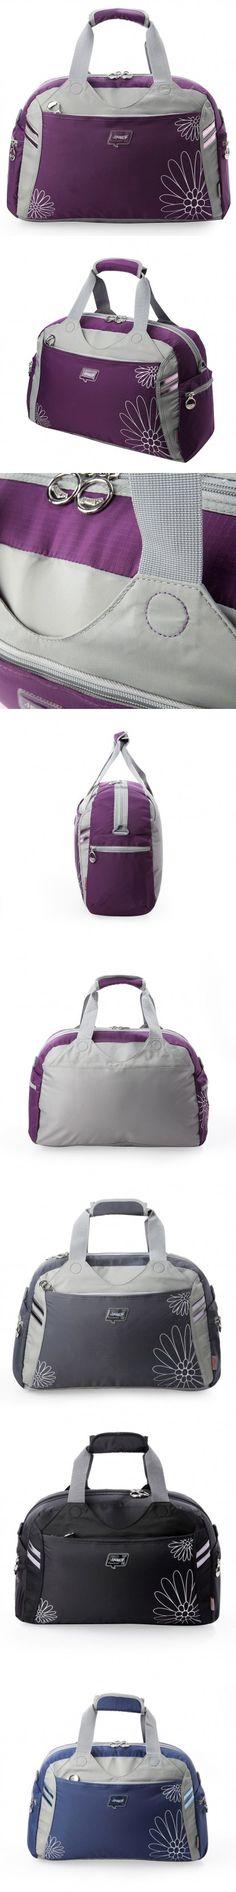 Sports Duffel Bags Oxford Textile Plant Flowers Hidden Zipper Pocket Japan And South Korea.